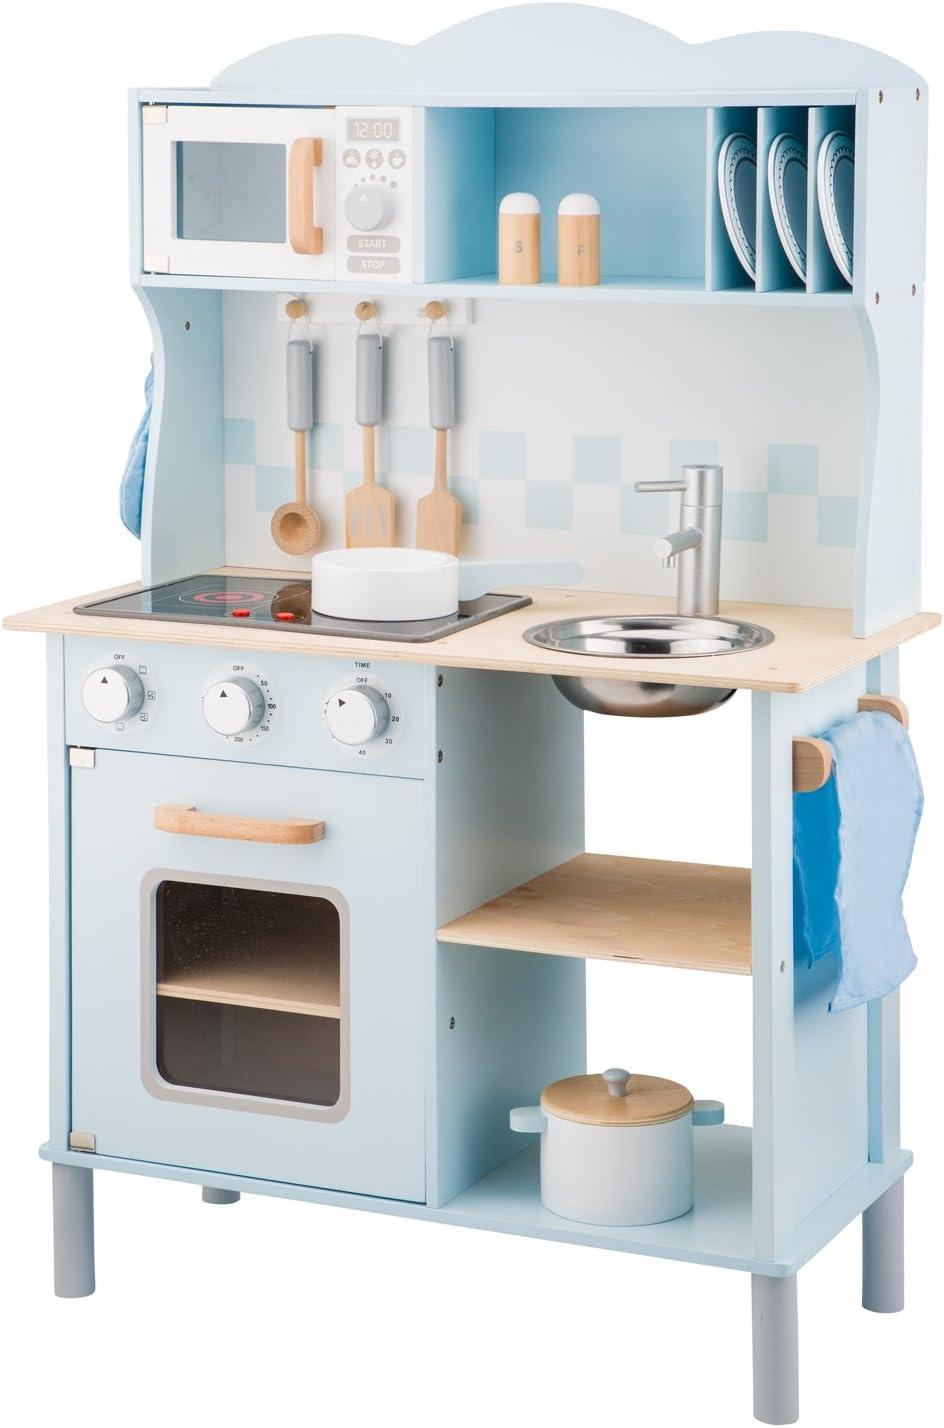 New Classic Toys 11065 Küchenzeile-Modern mit Kochfeld, Multi Color Blau